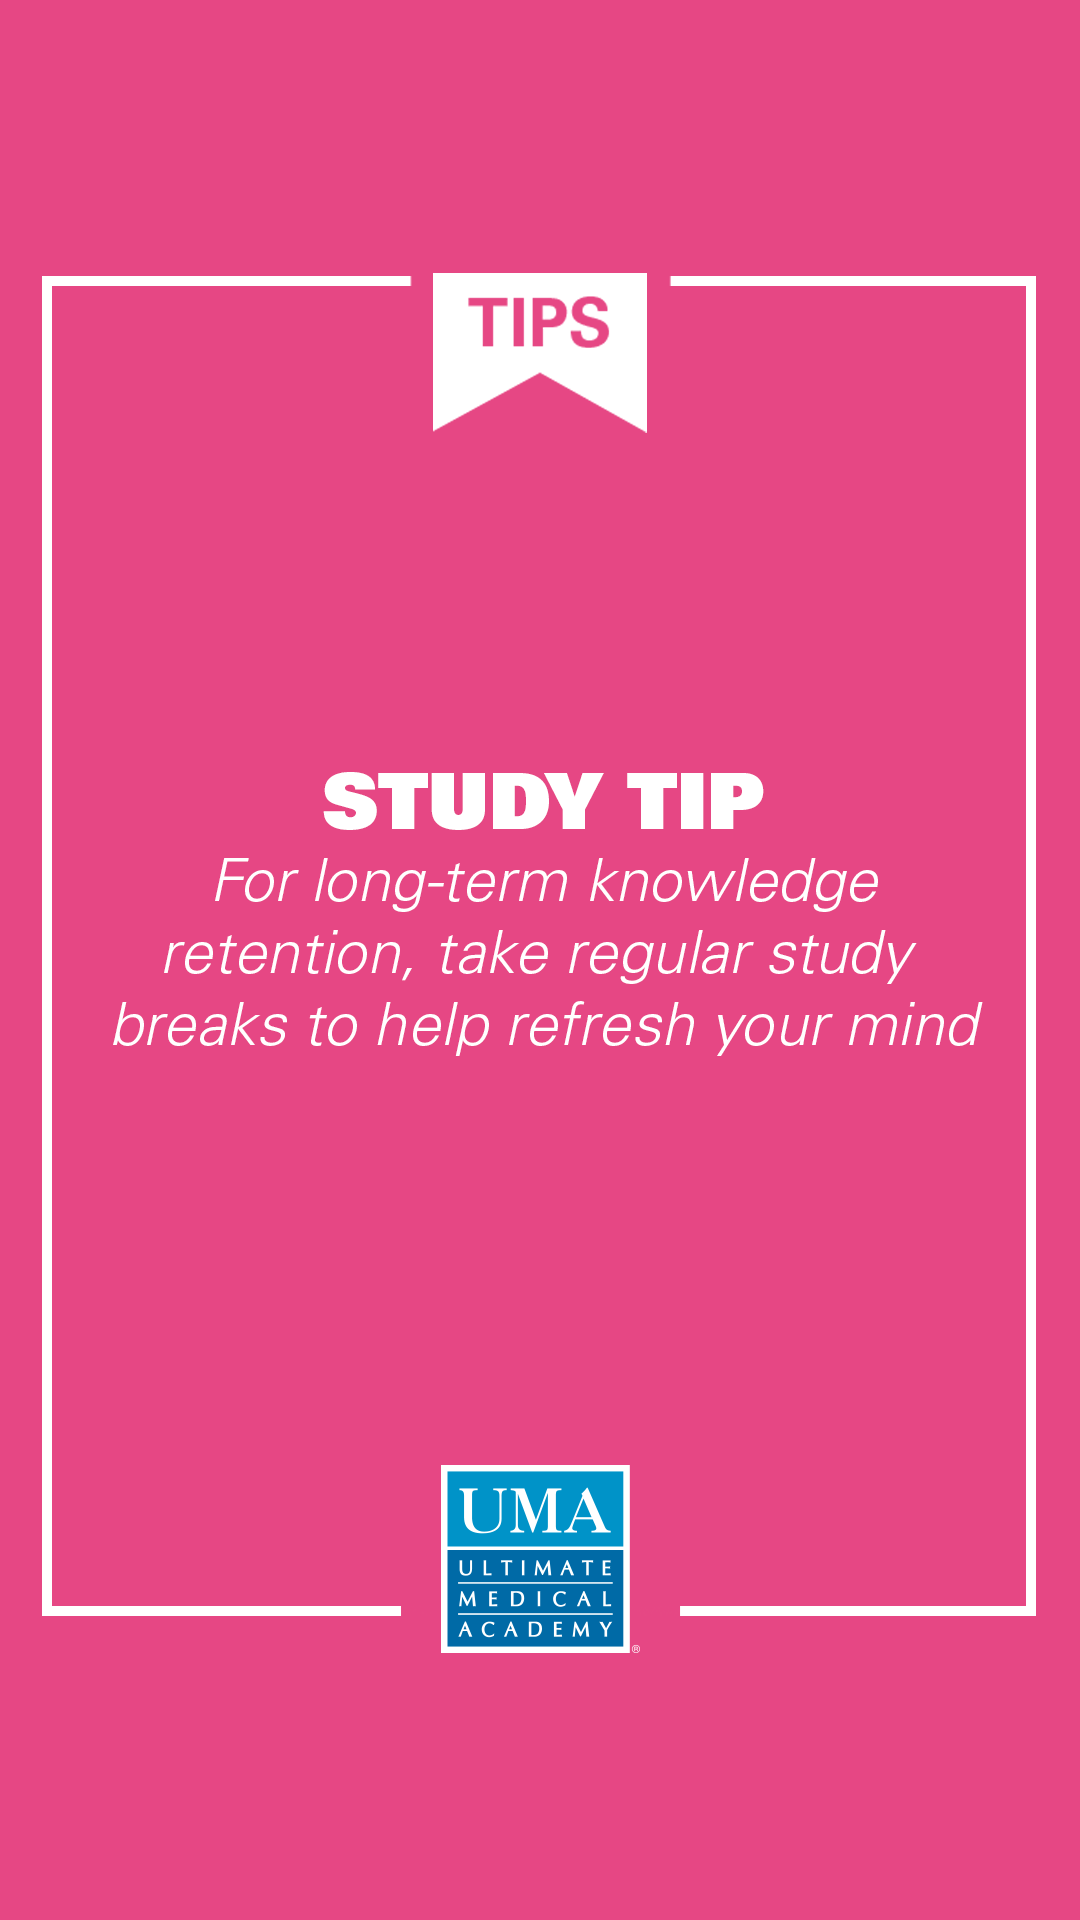 studytip studentlife studenttips